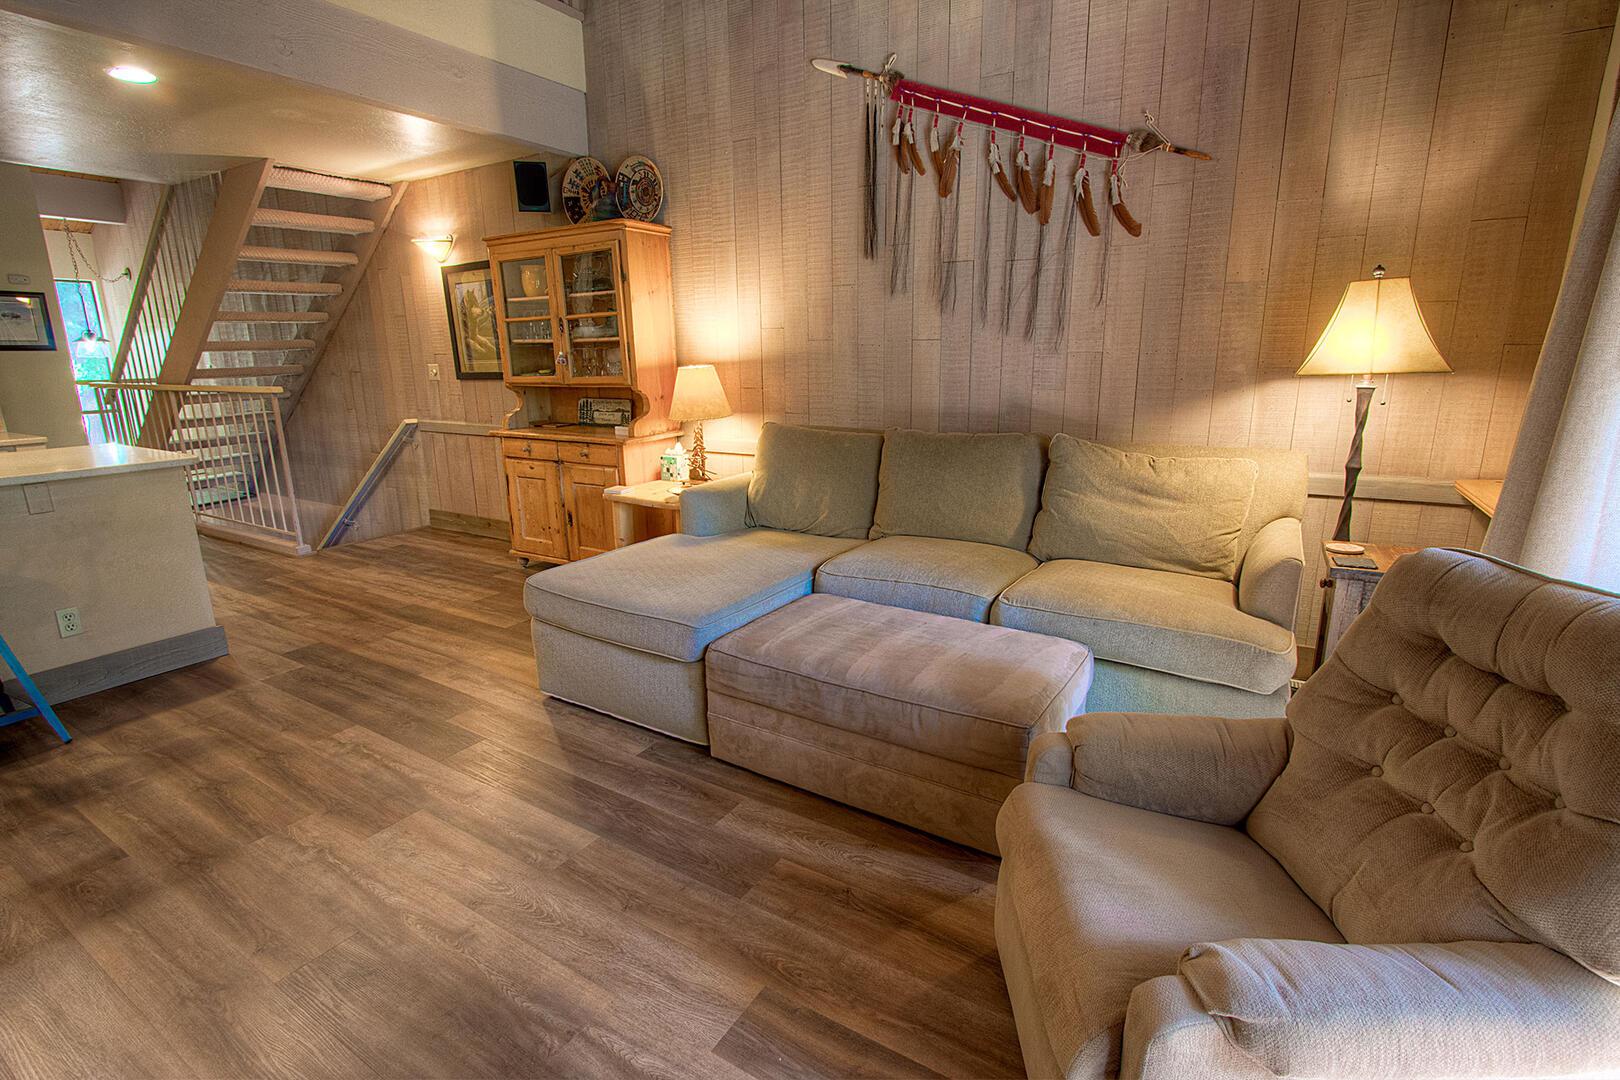 kwc0854 Living Room